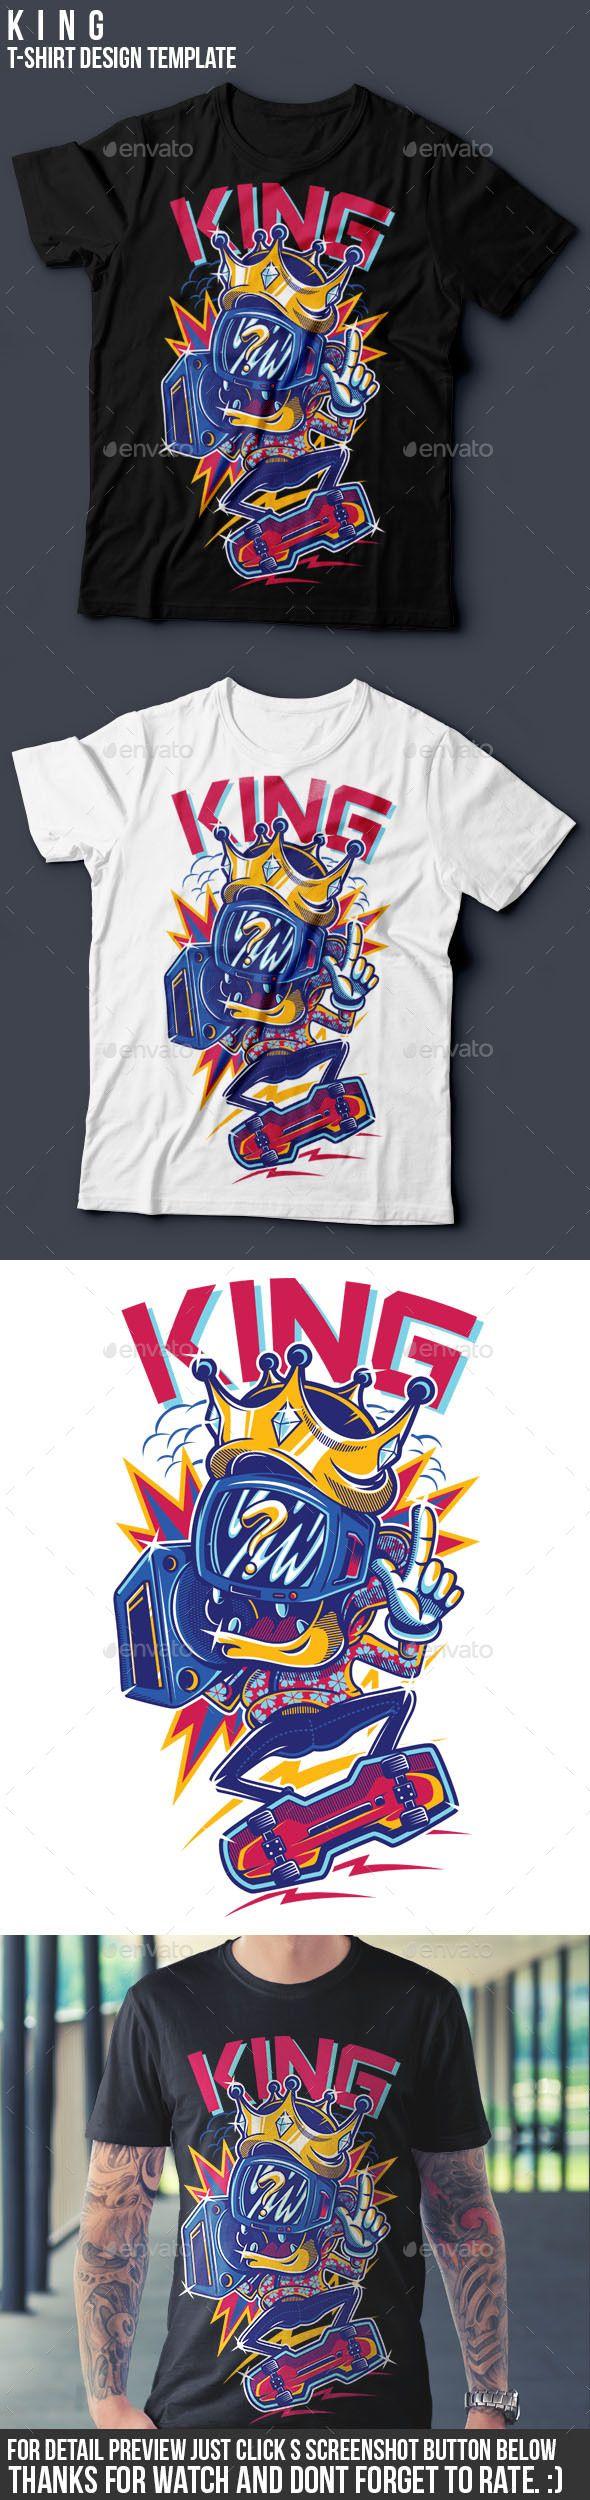 Shirt design eps - King T Shirt Design Eps Template Download Https Graphicriver